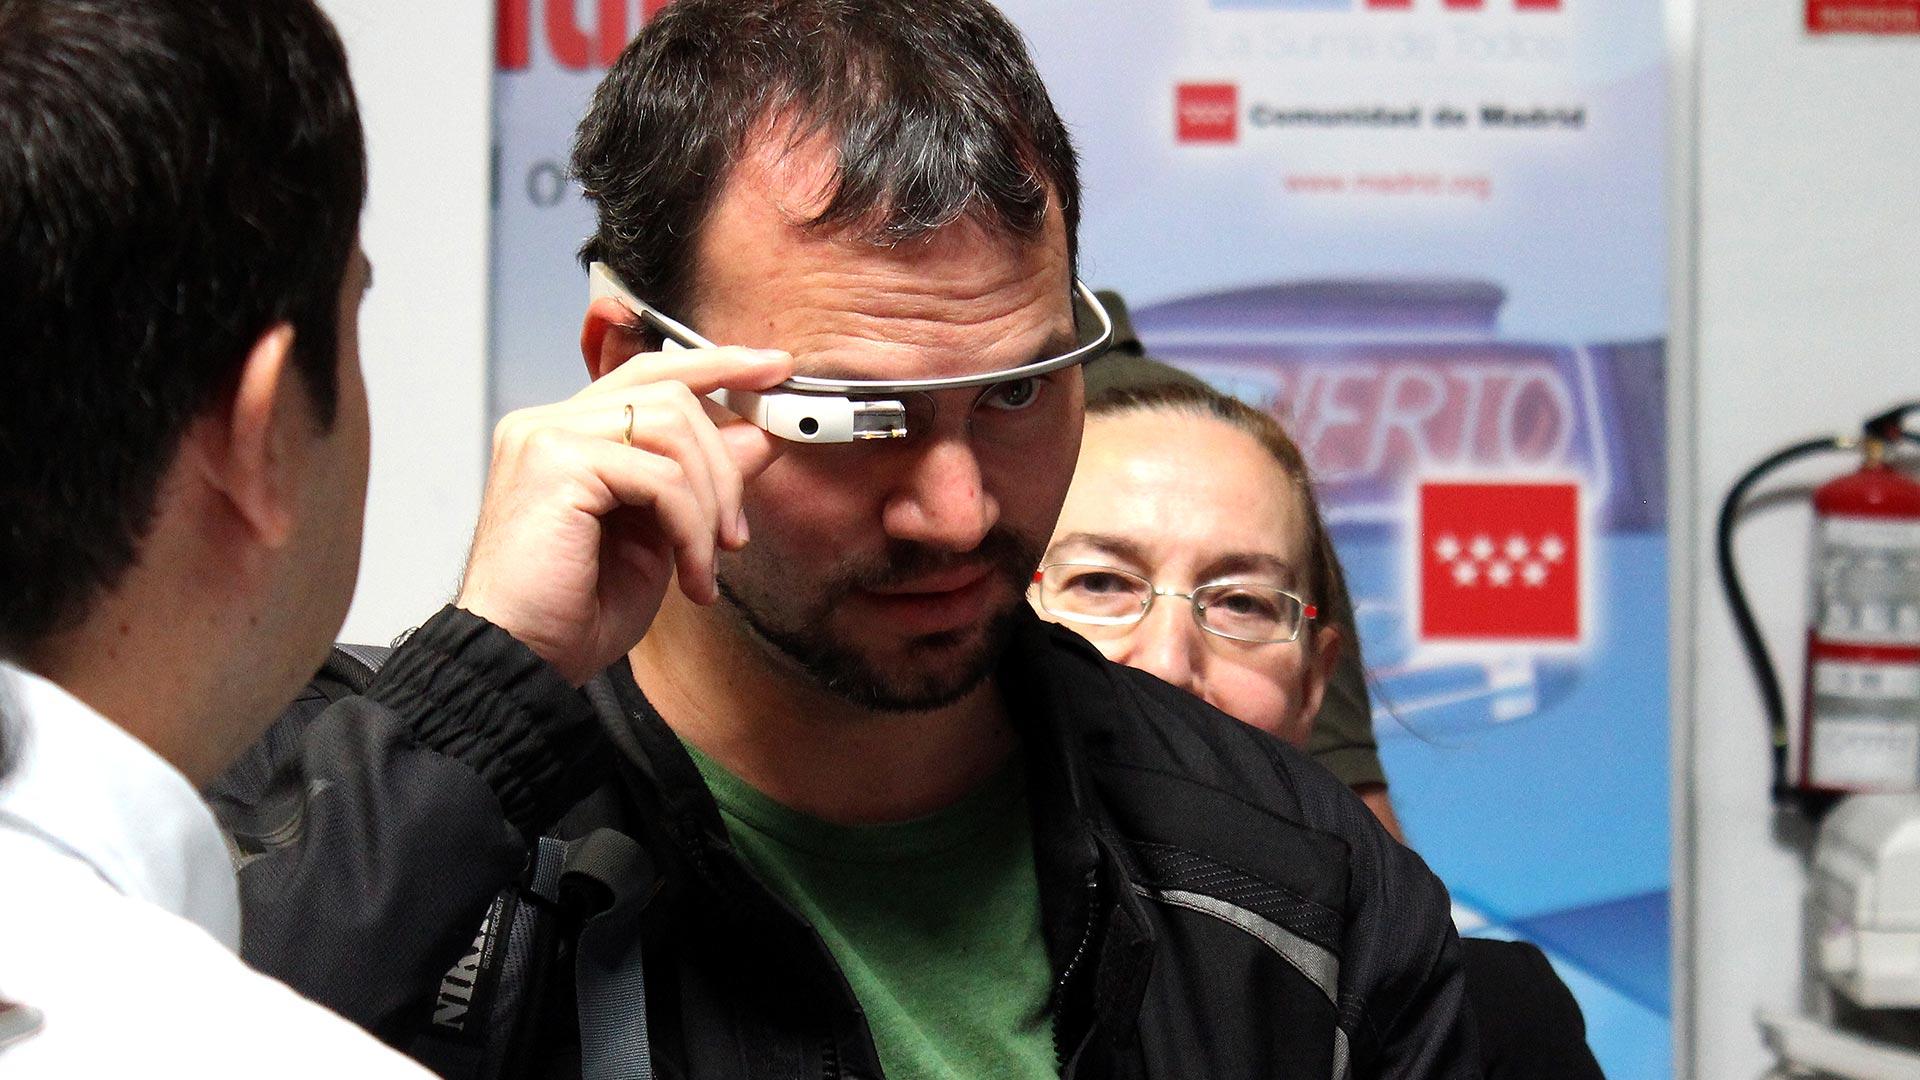 tpnet-eventos-encuentros-profesionales-iot-google-glasses-tester-2